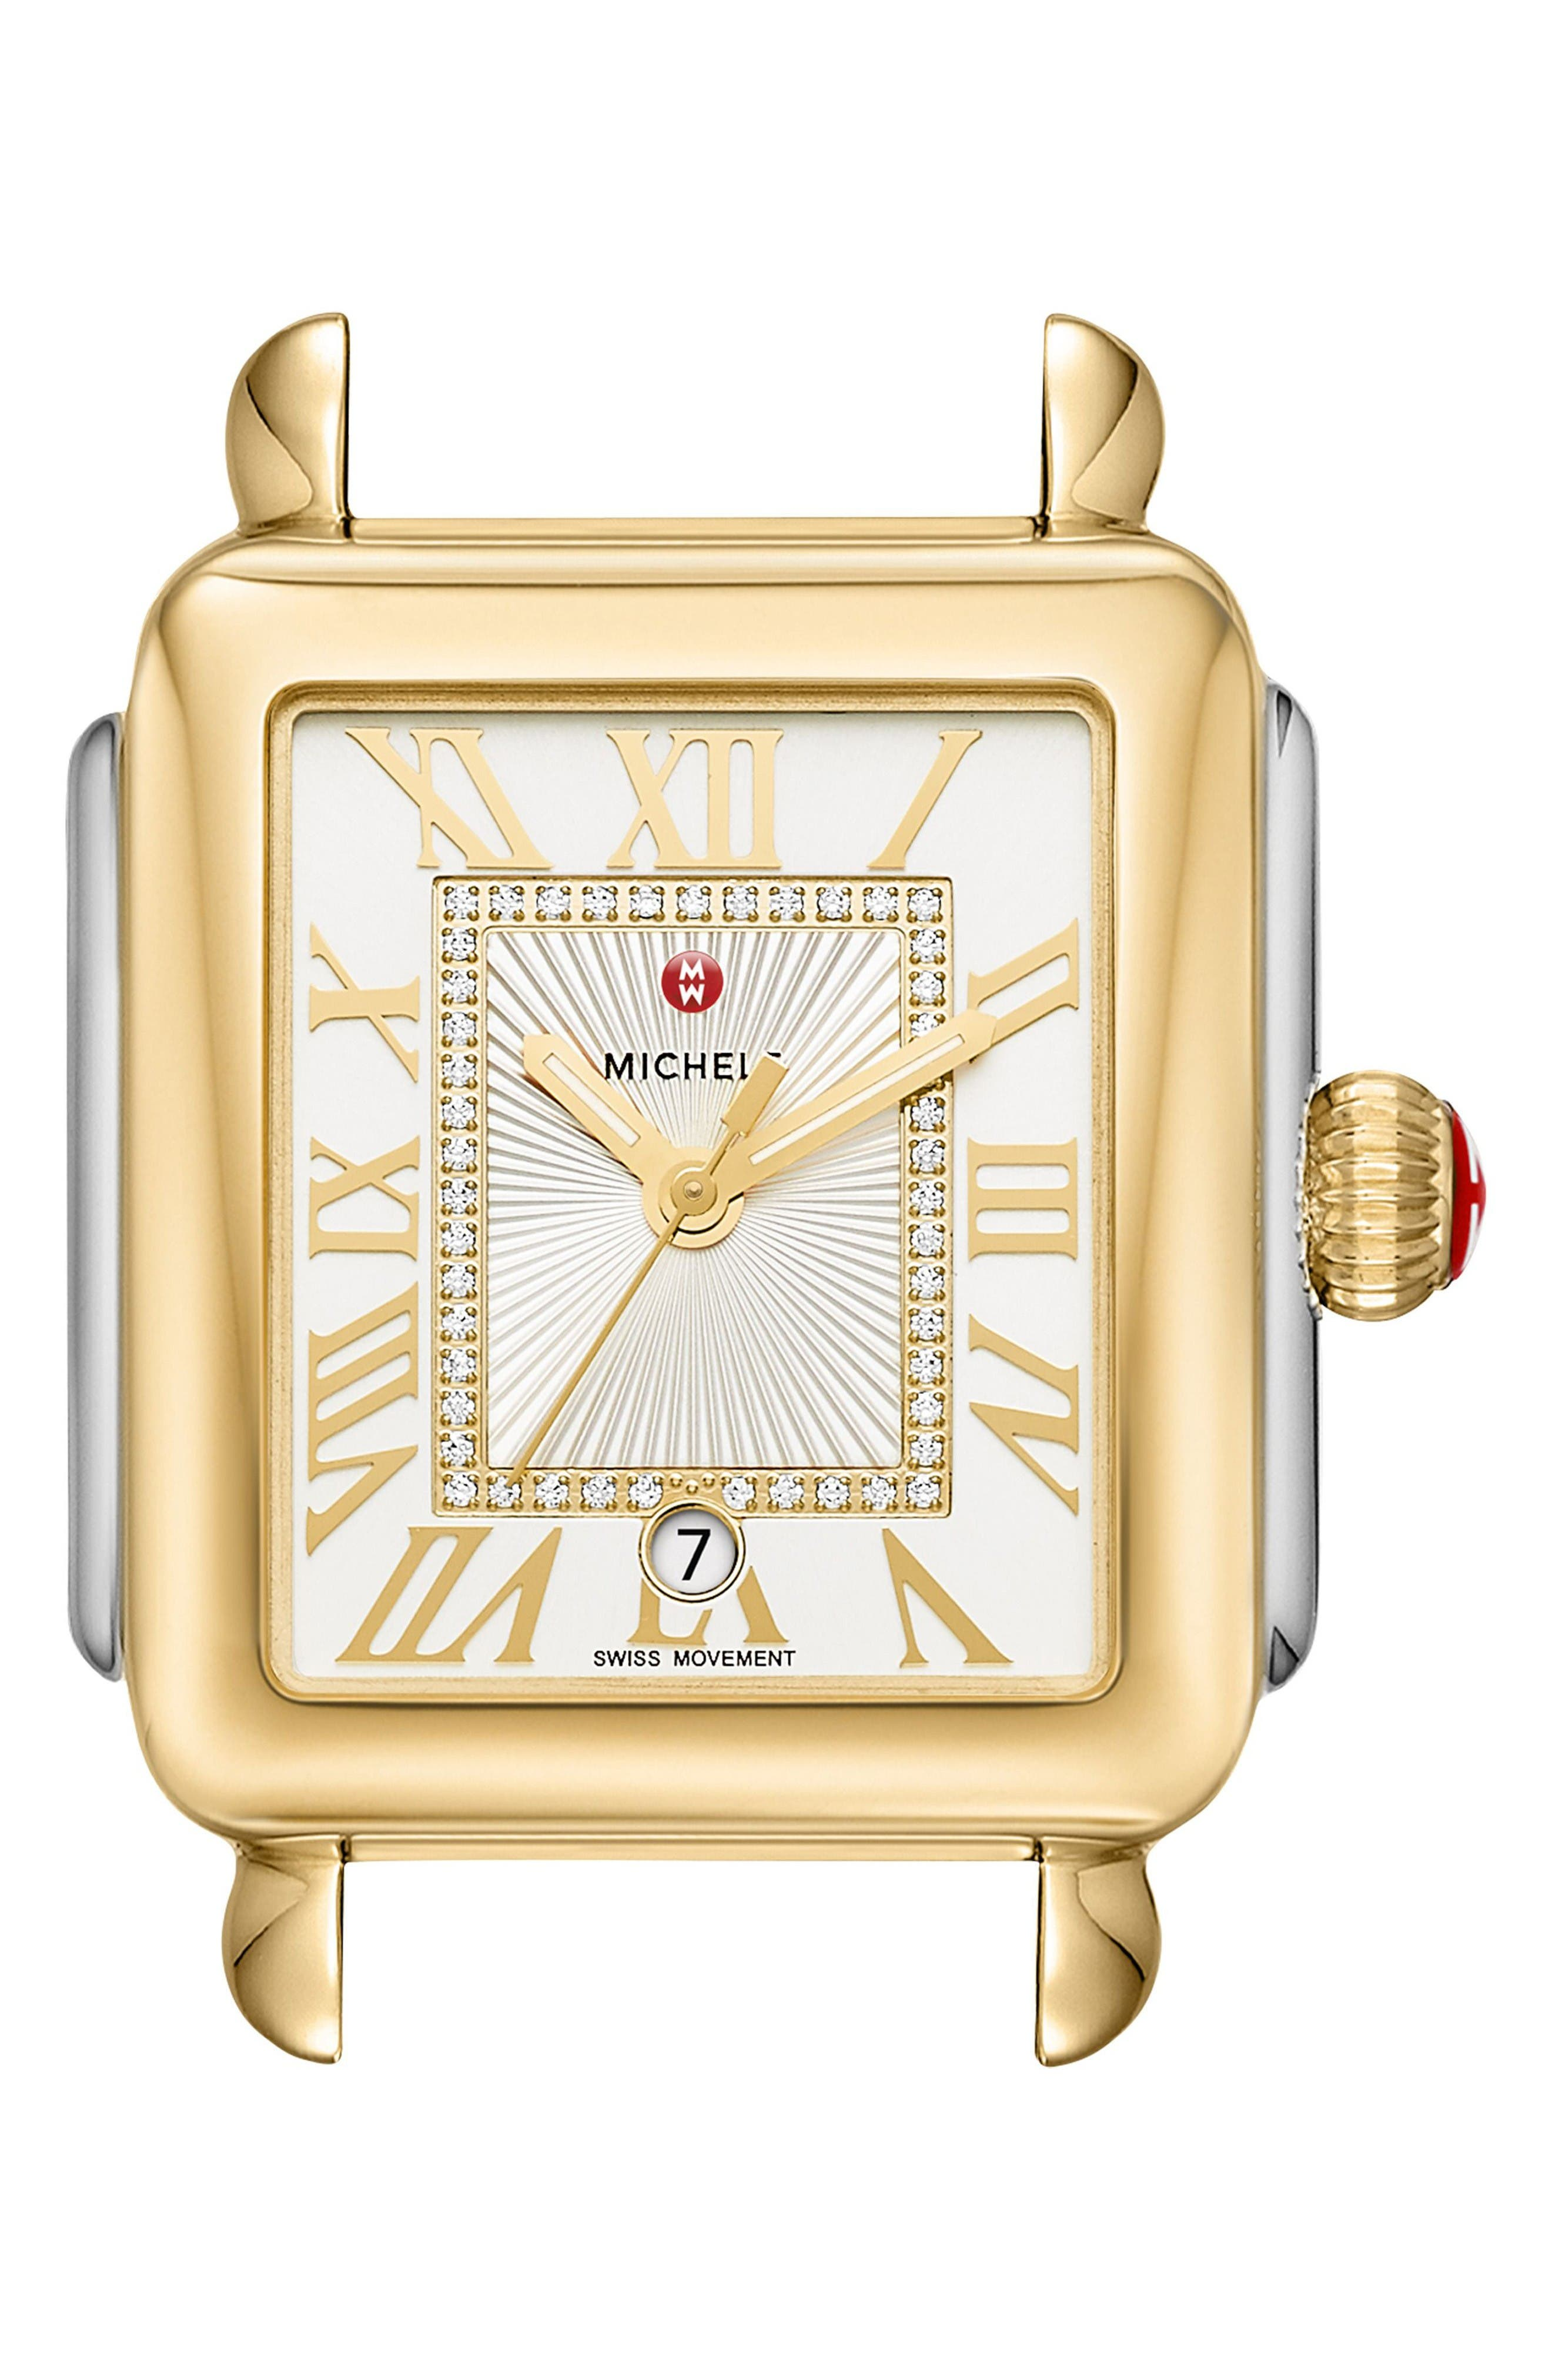 Main Image - MICHELE Deco Madison Diamond Dial Watch Case, 33mm x 35mm